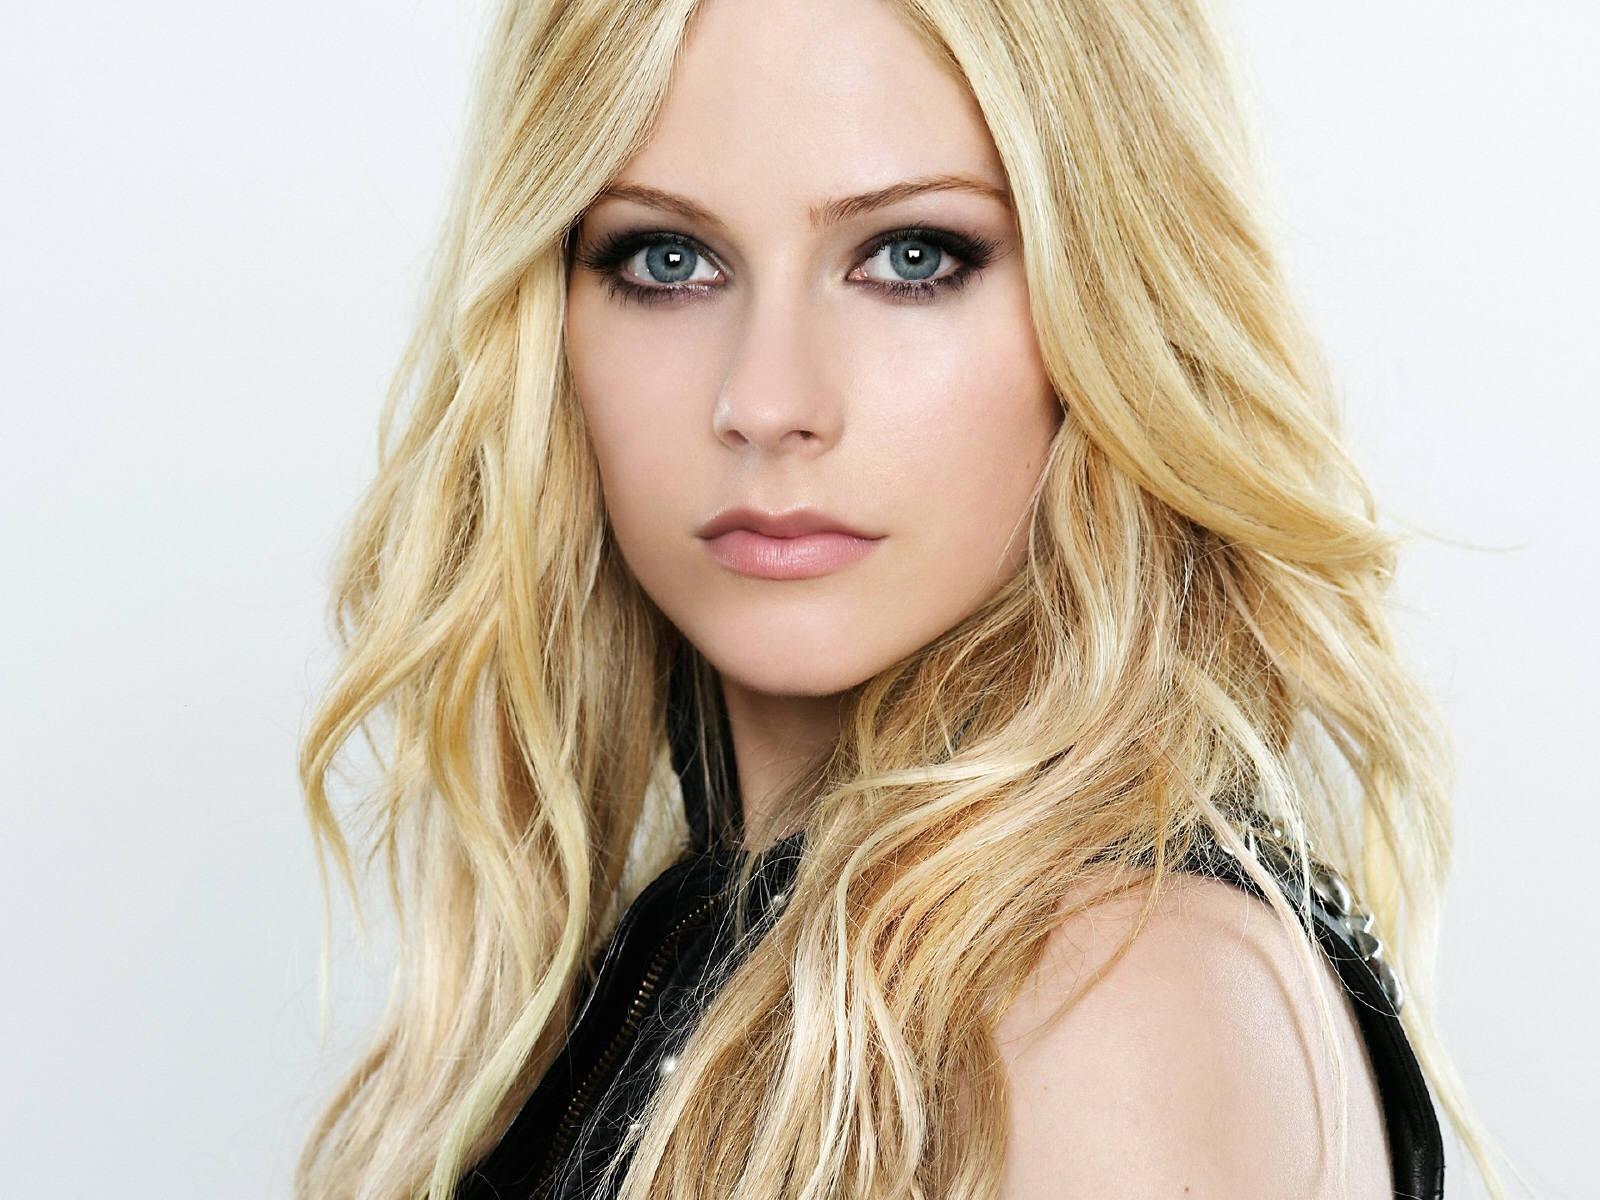 http://4.bp.blogspot.com/-qf6pYN6LDMo/TzycuLsVnjI/AAAAAAAAHdk/4cgq0FYYluE/s1600/celebrity%2B1.jpg